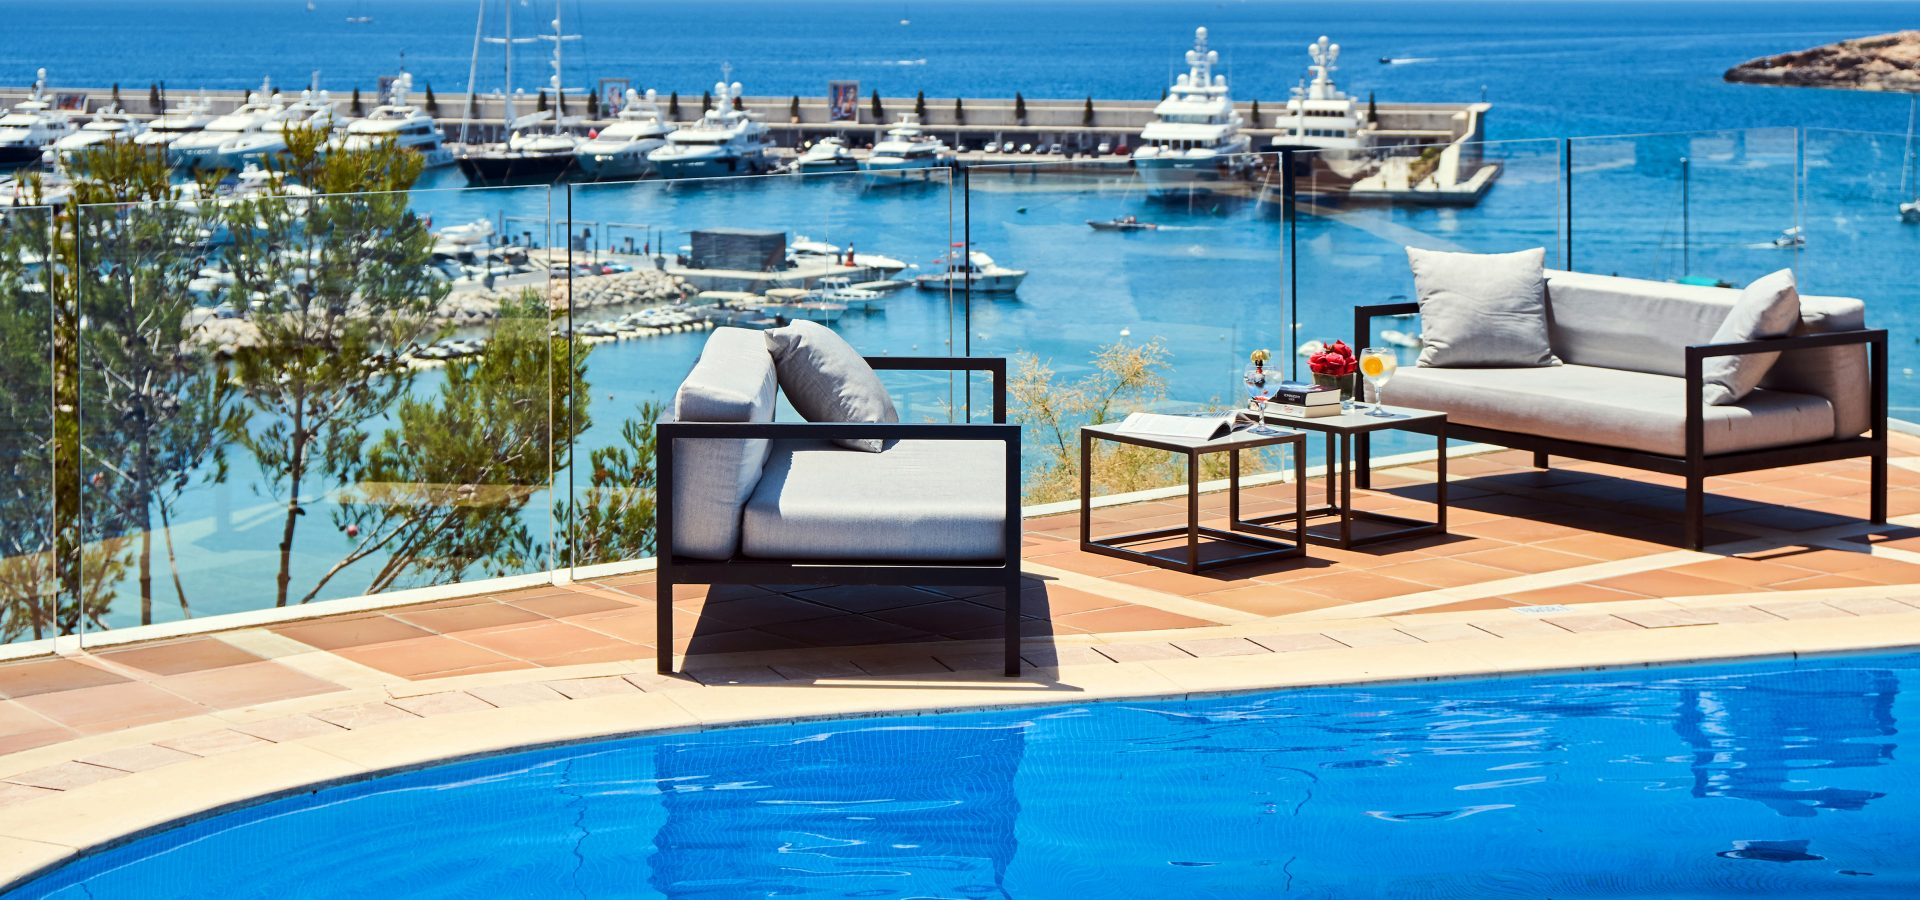 Port adriano luxury 5 star hotel pure salt port adriano for Designer hotels mallorca